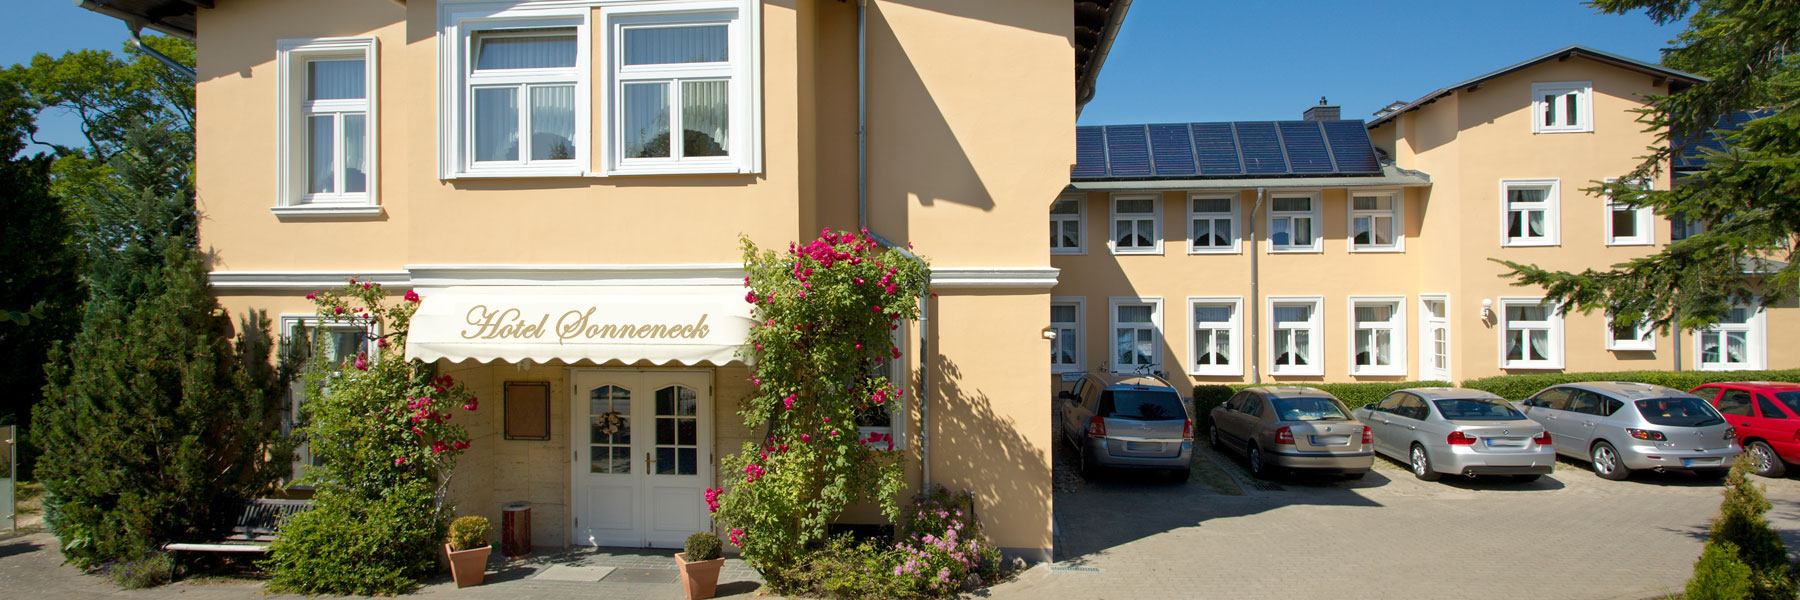 Eingang - Hotel Sonneneck